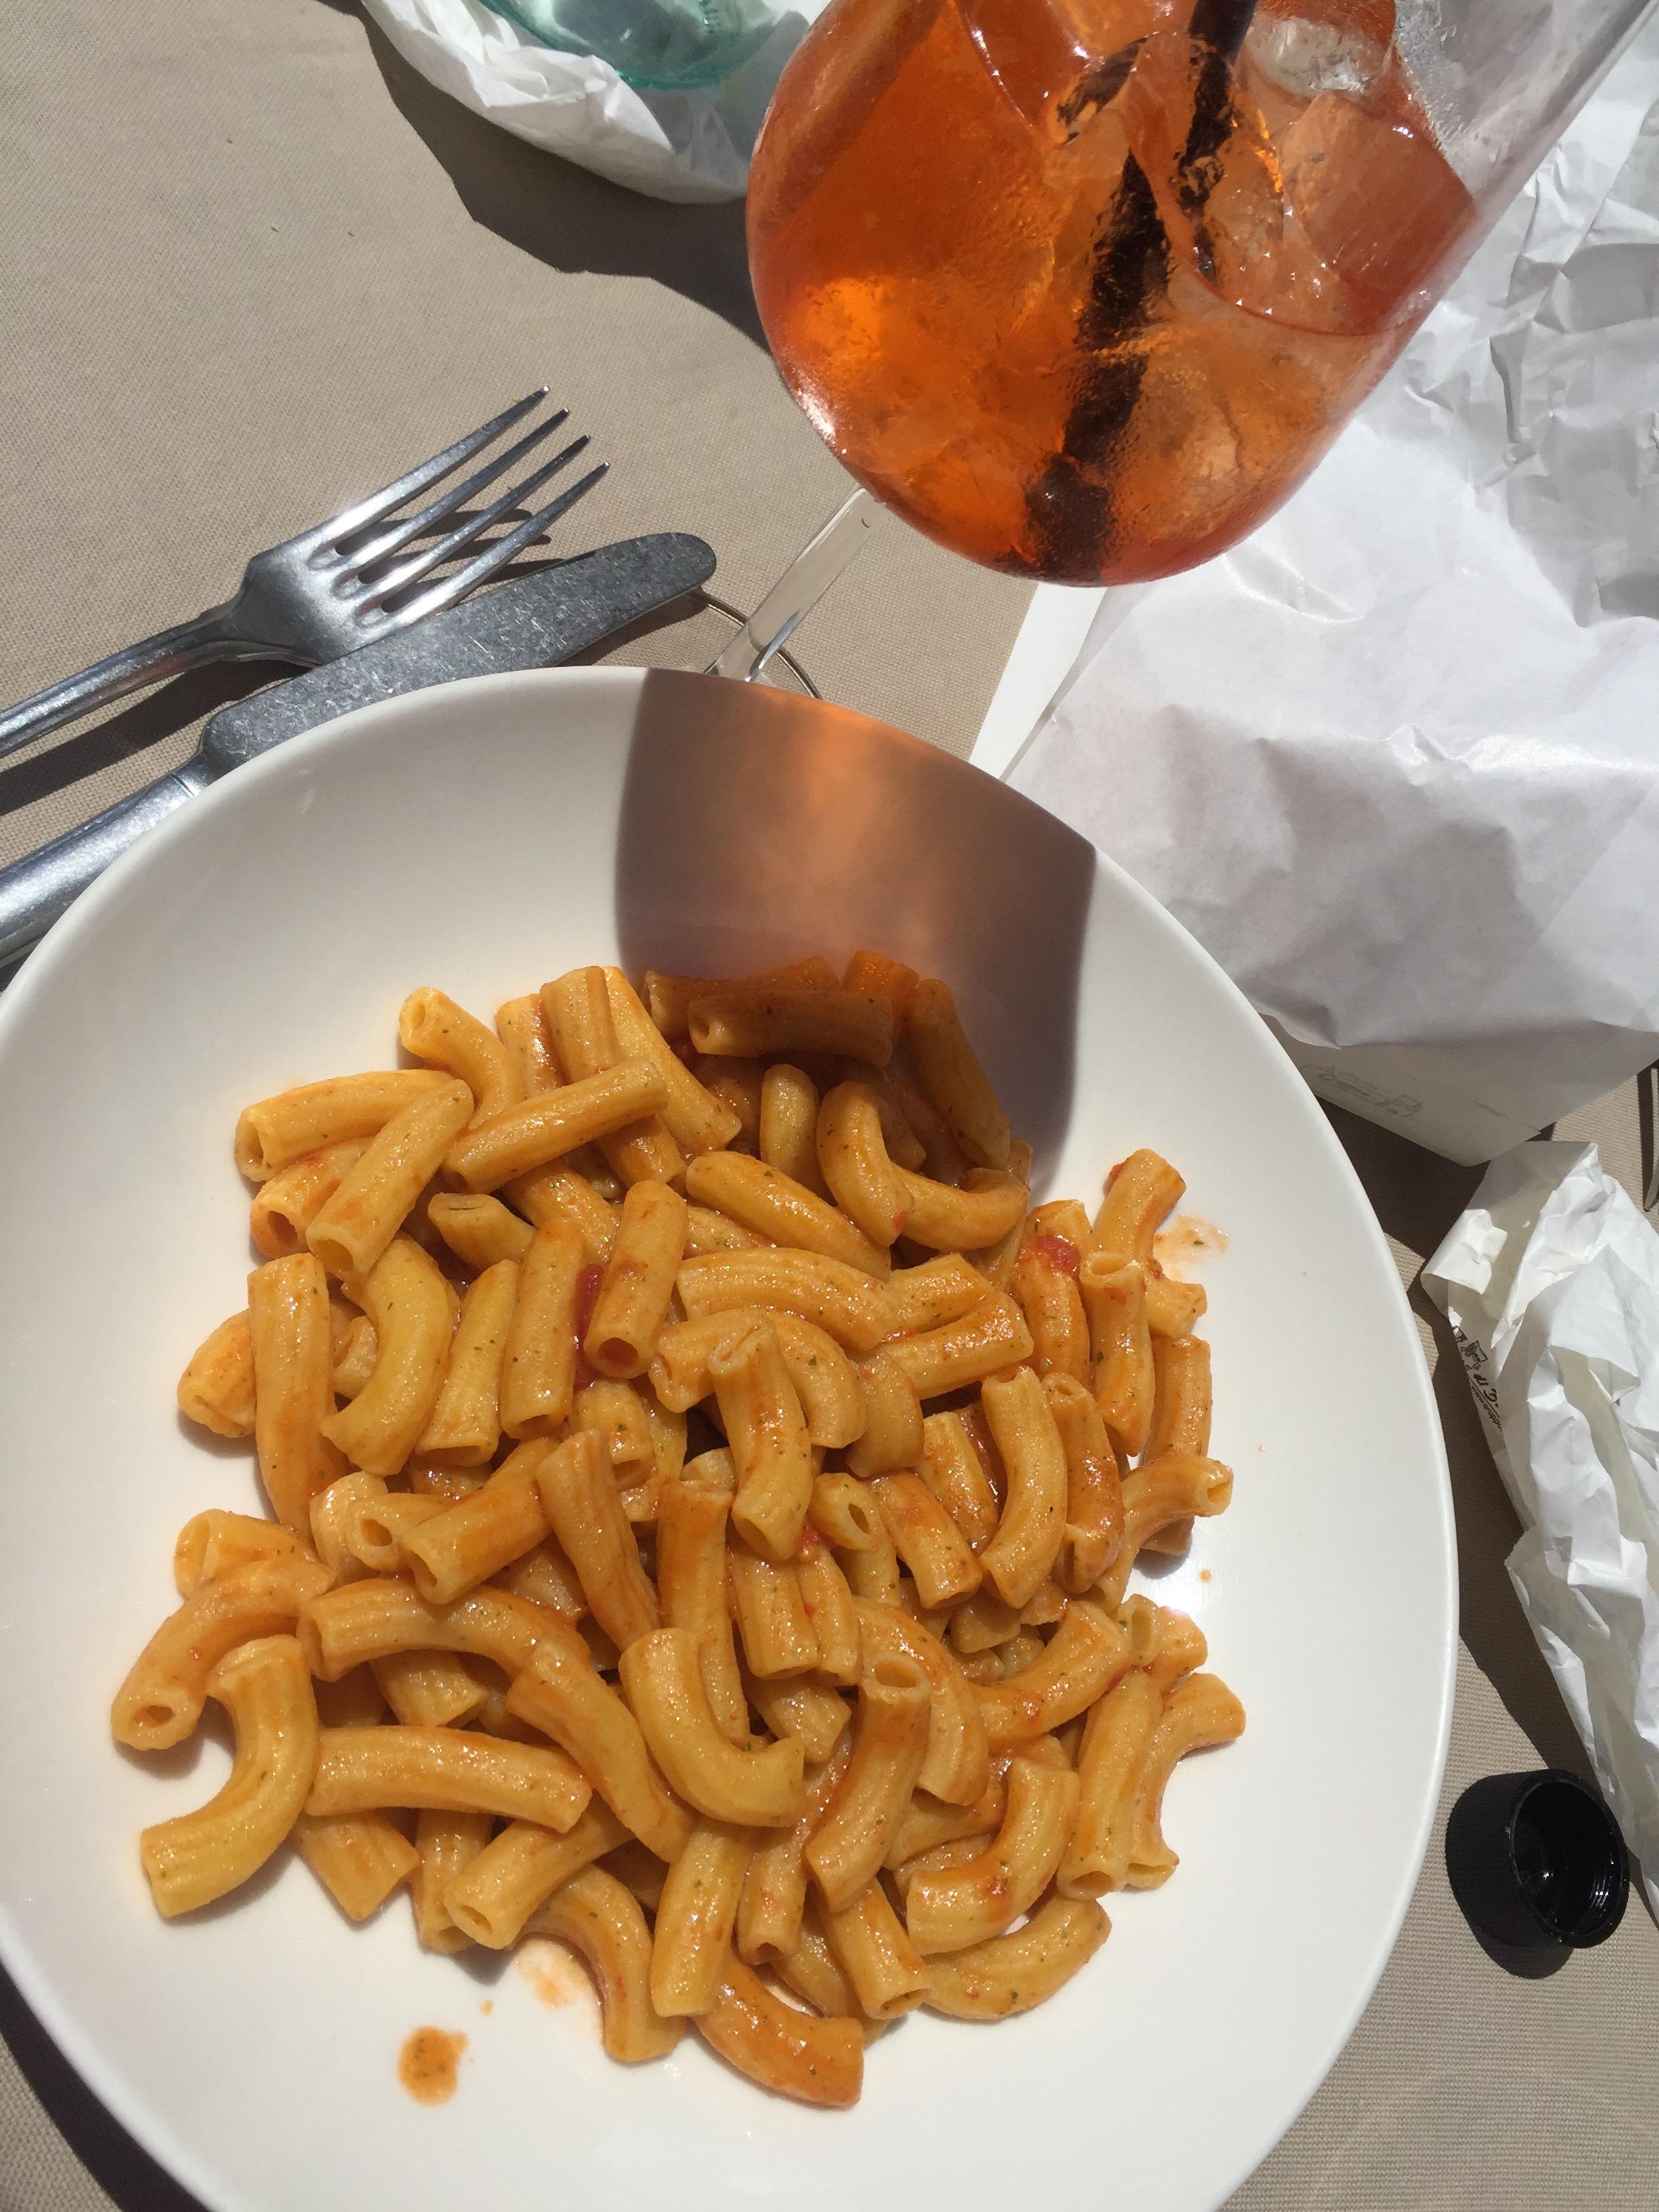 maccheroni and aperol spritz in Perugia